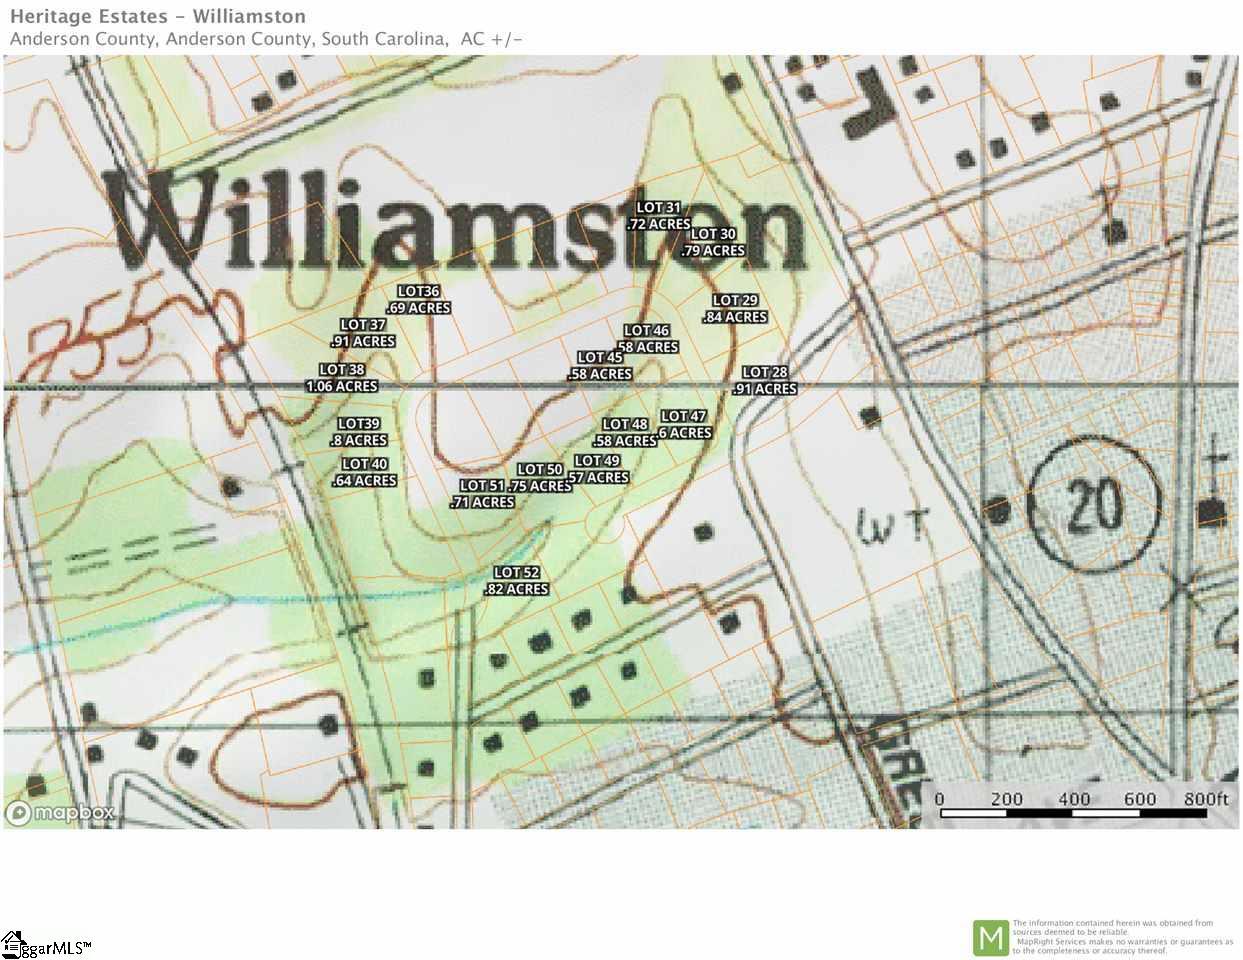 Simpson Street, Williamston, 29697 | Berkshire Hathaway HomeServices C  Dan  Joyner, REALTORS